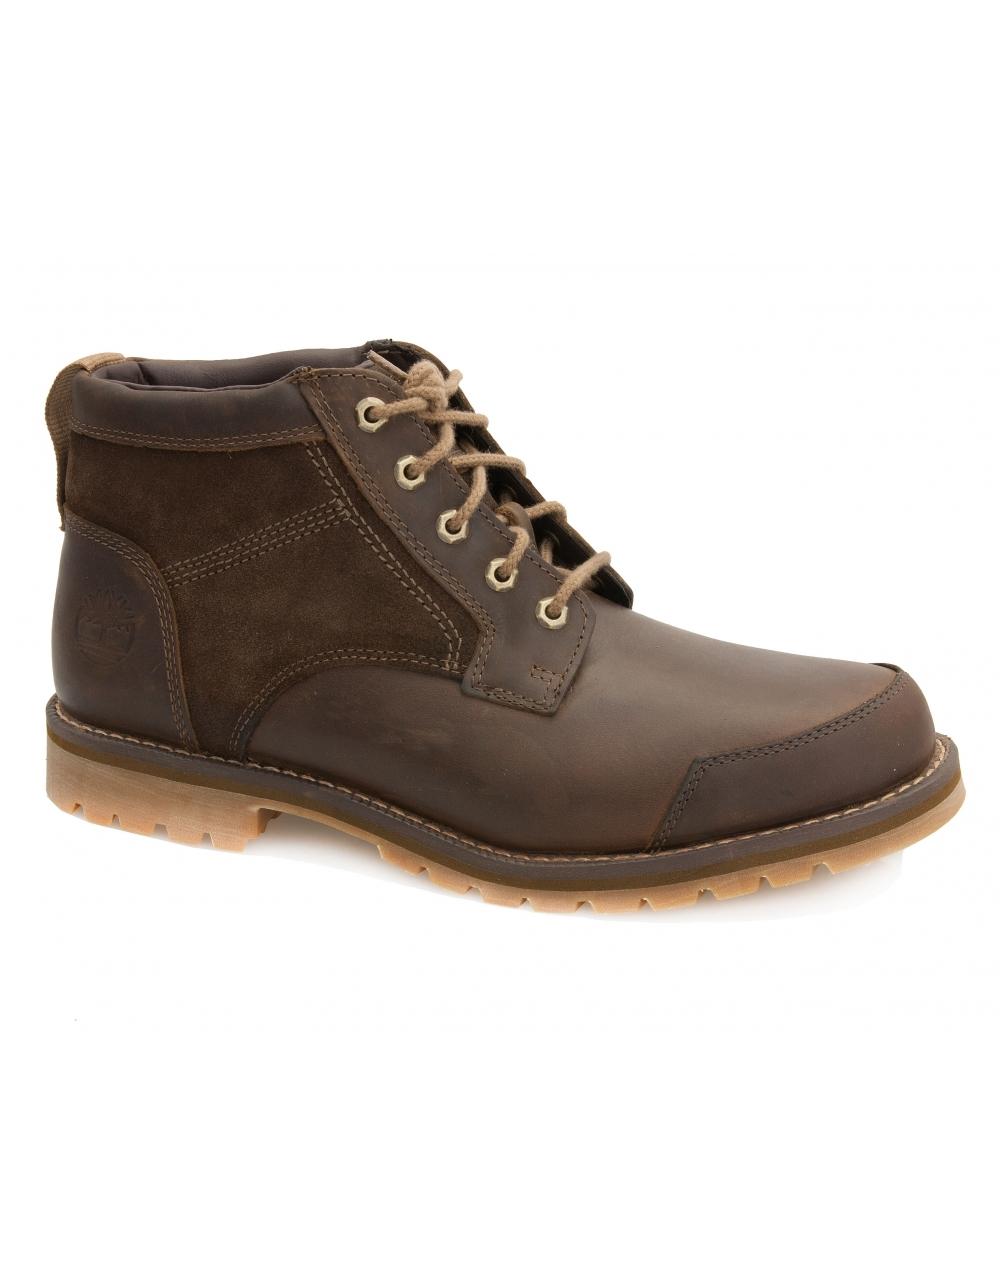 1a7f3dab4ef Larchmont Gaucho Leather & Suede Saddleback Chukka Boot - Dark Brown